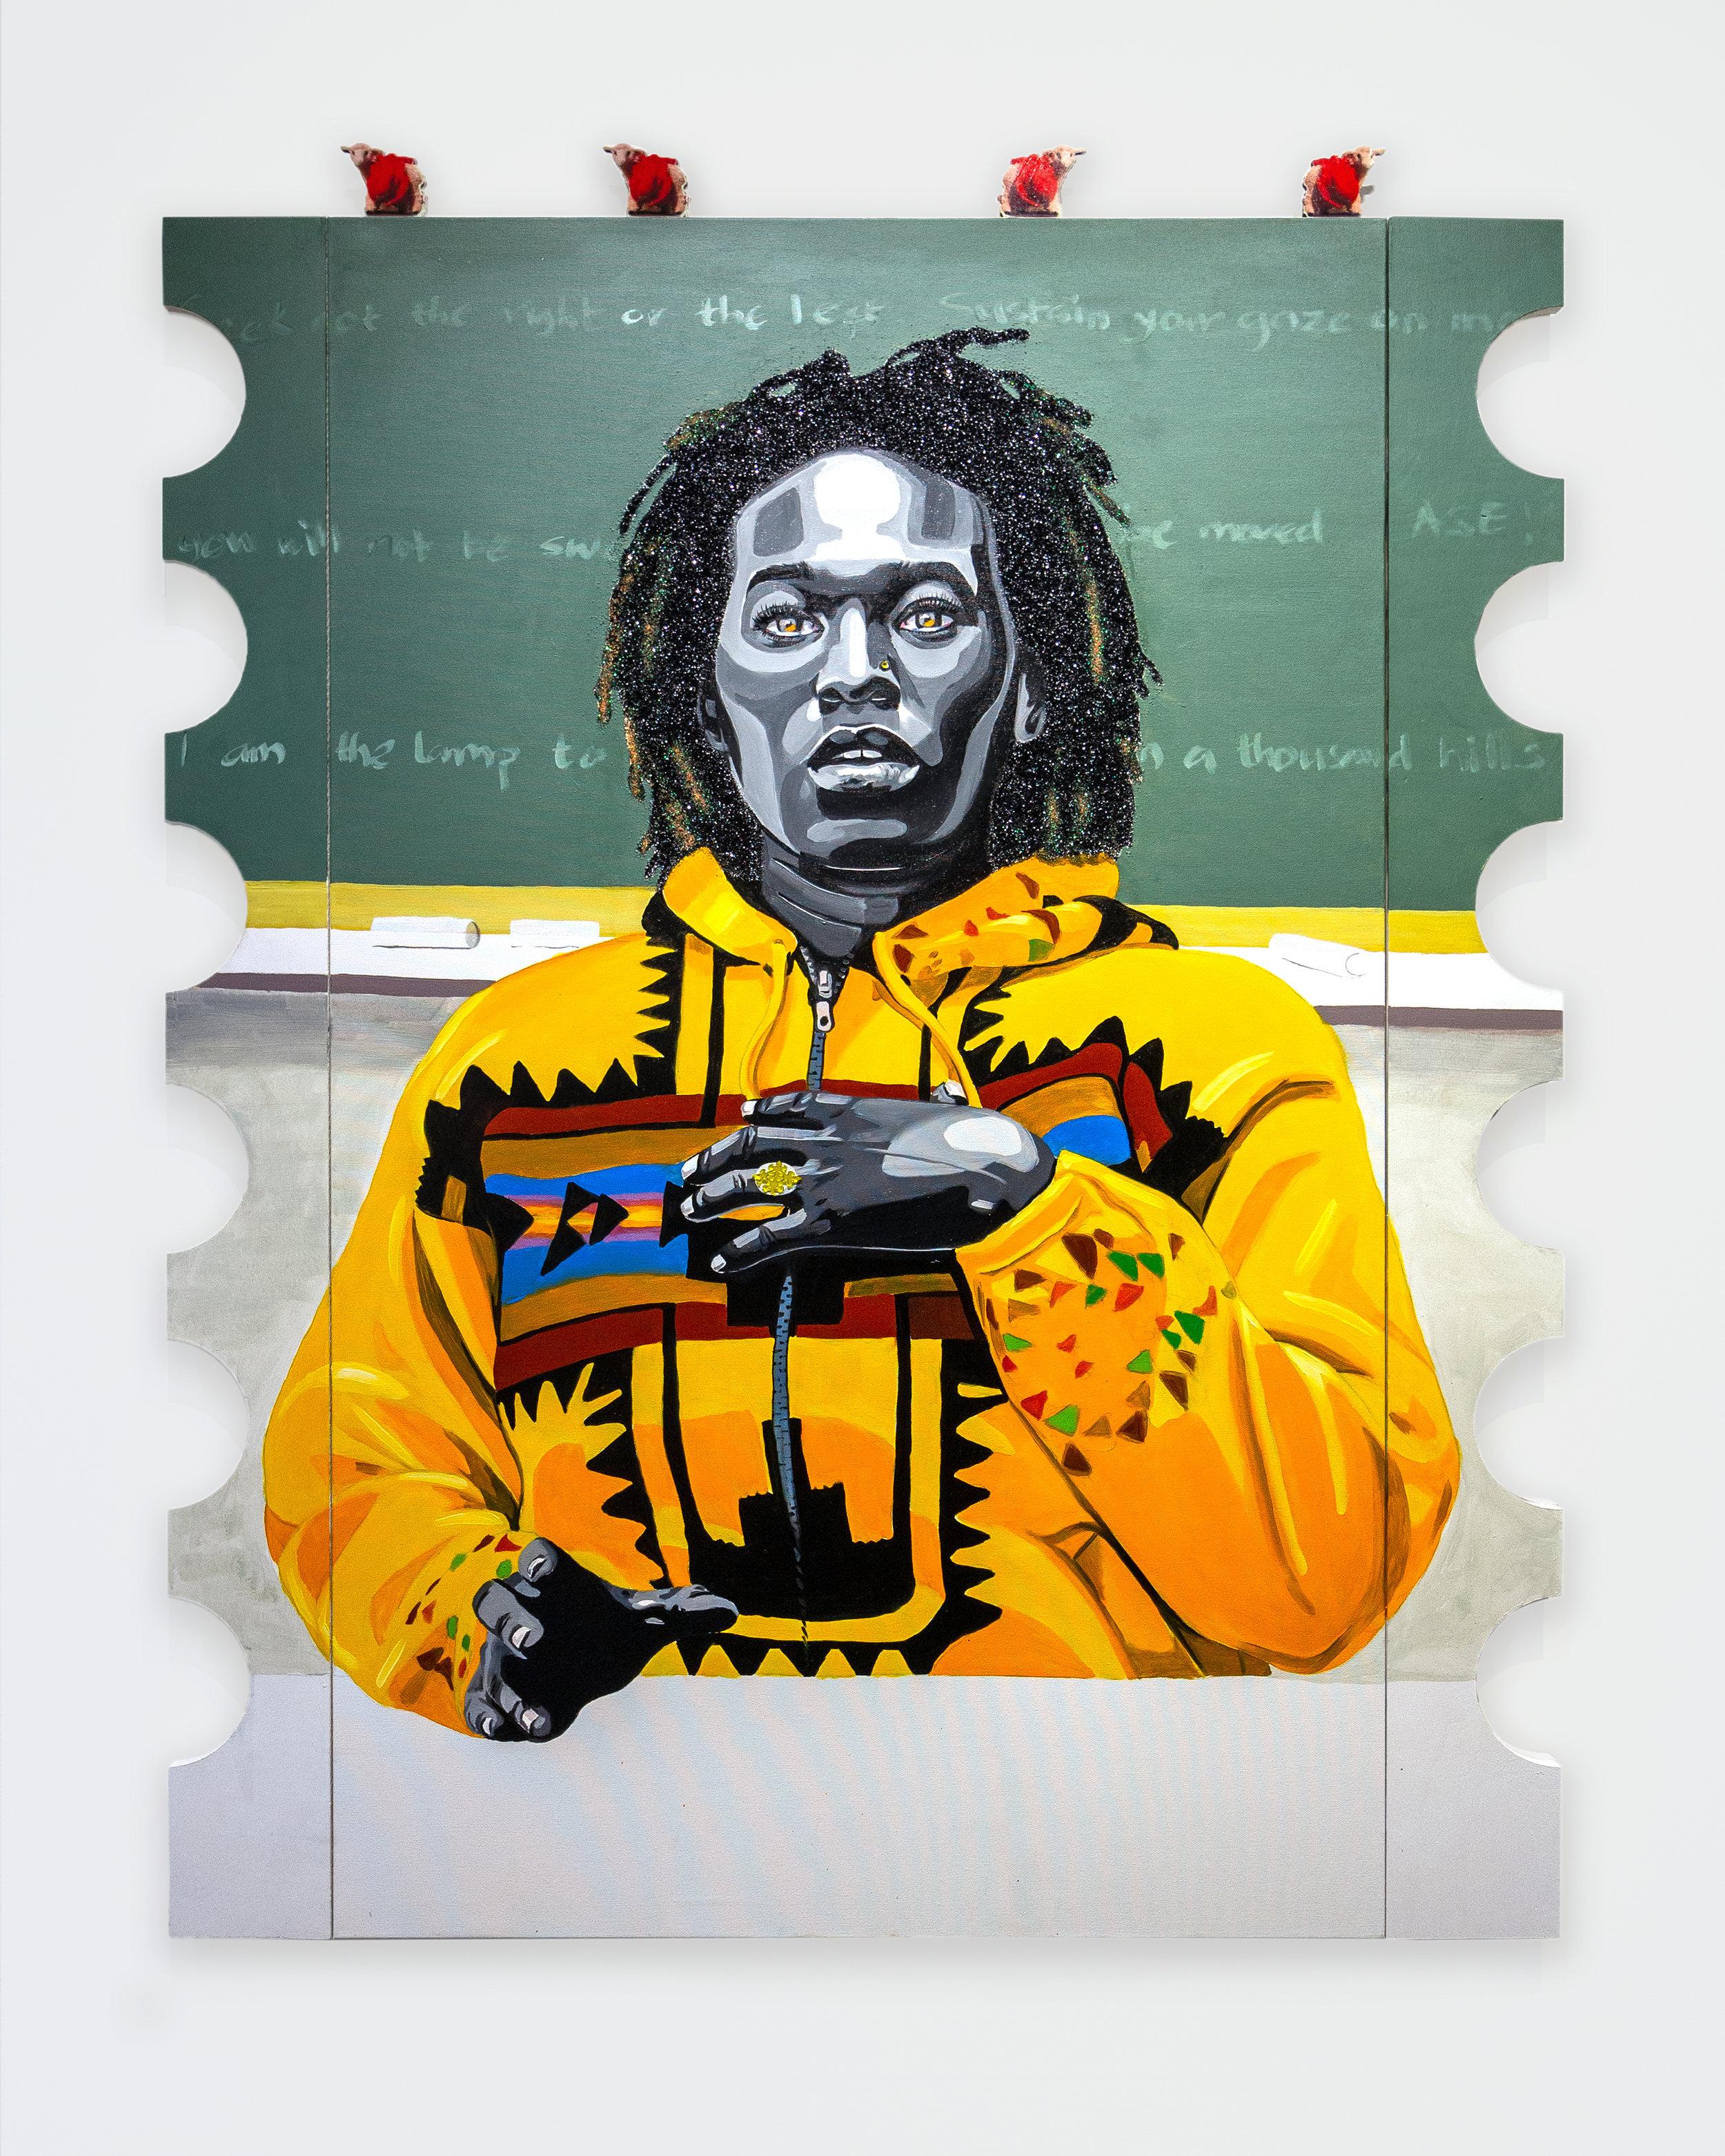 Conrad Egyir  -  Qhristine, Me'usa , 2018 Acrylic, oil, glitter, mounted plexi and wood on canvas 66h x 48w inches